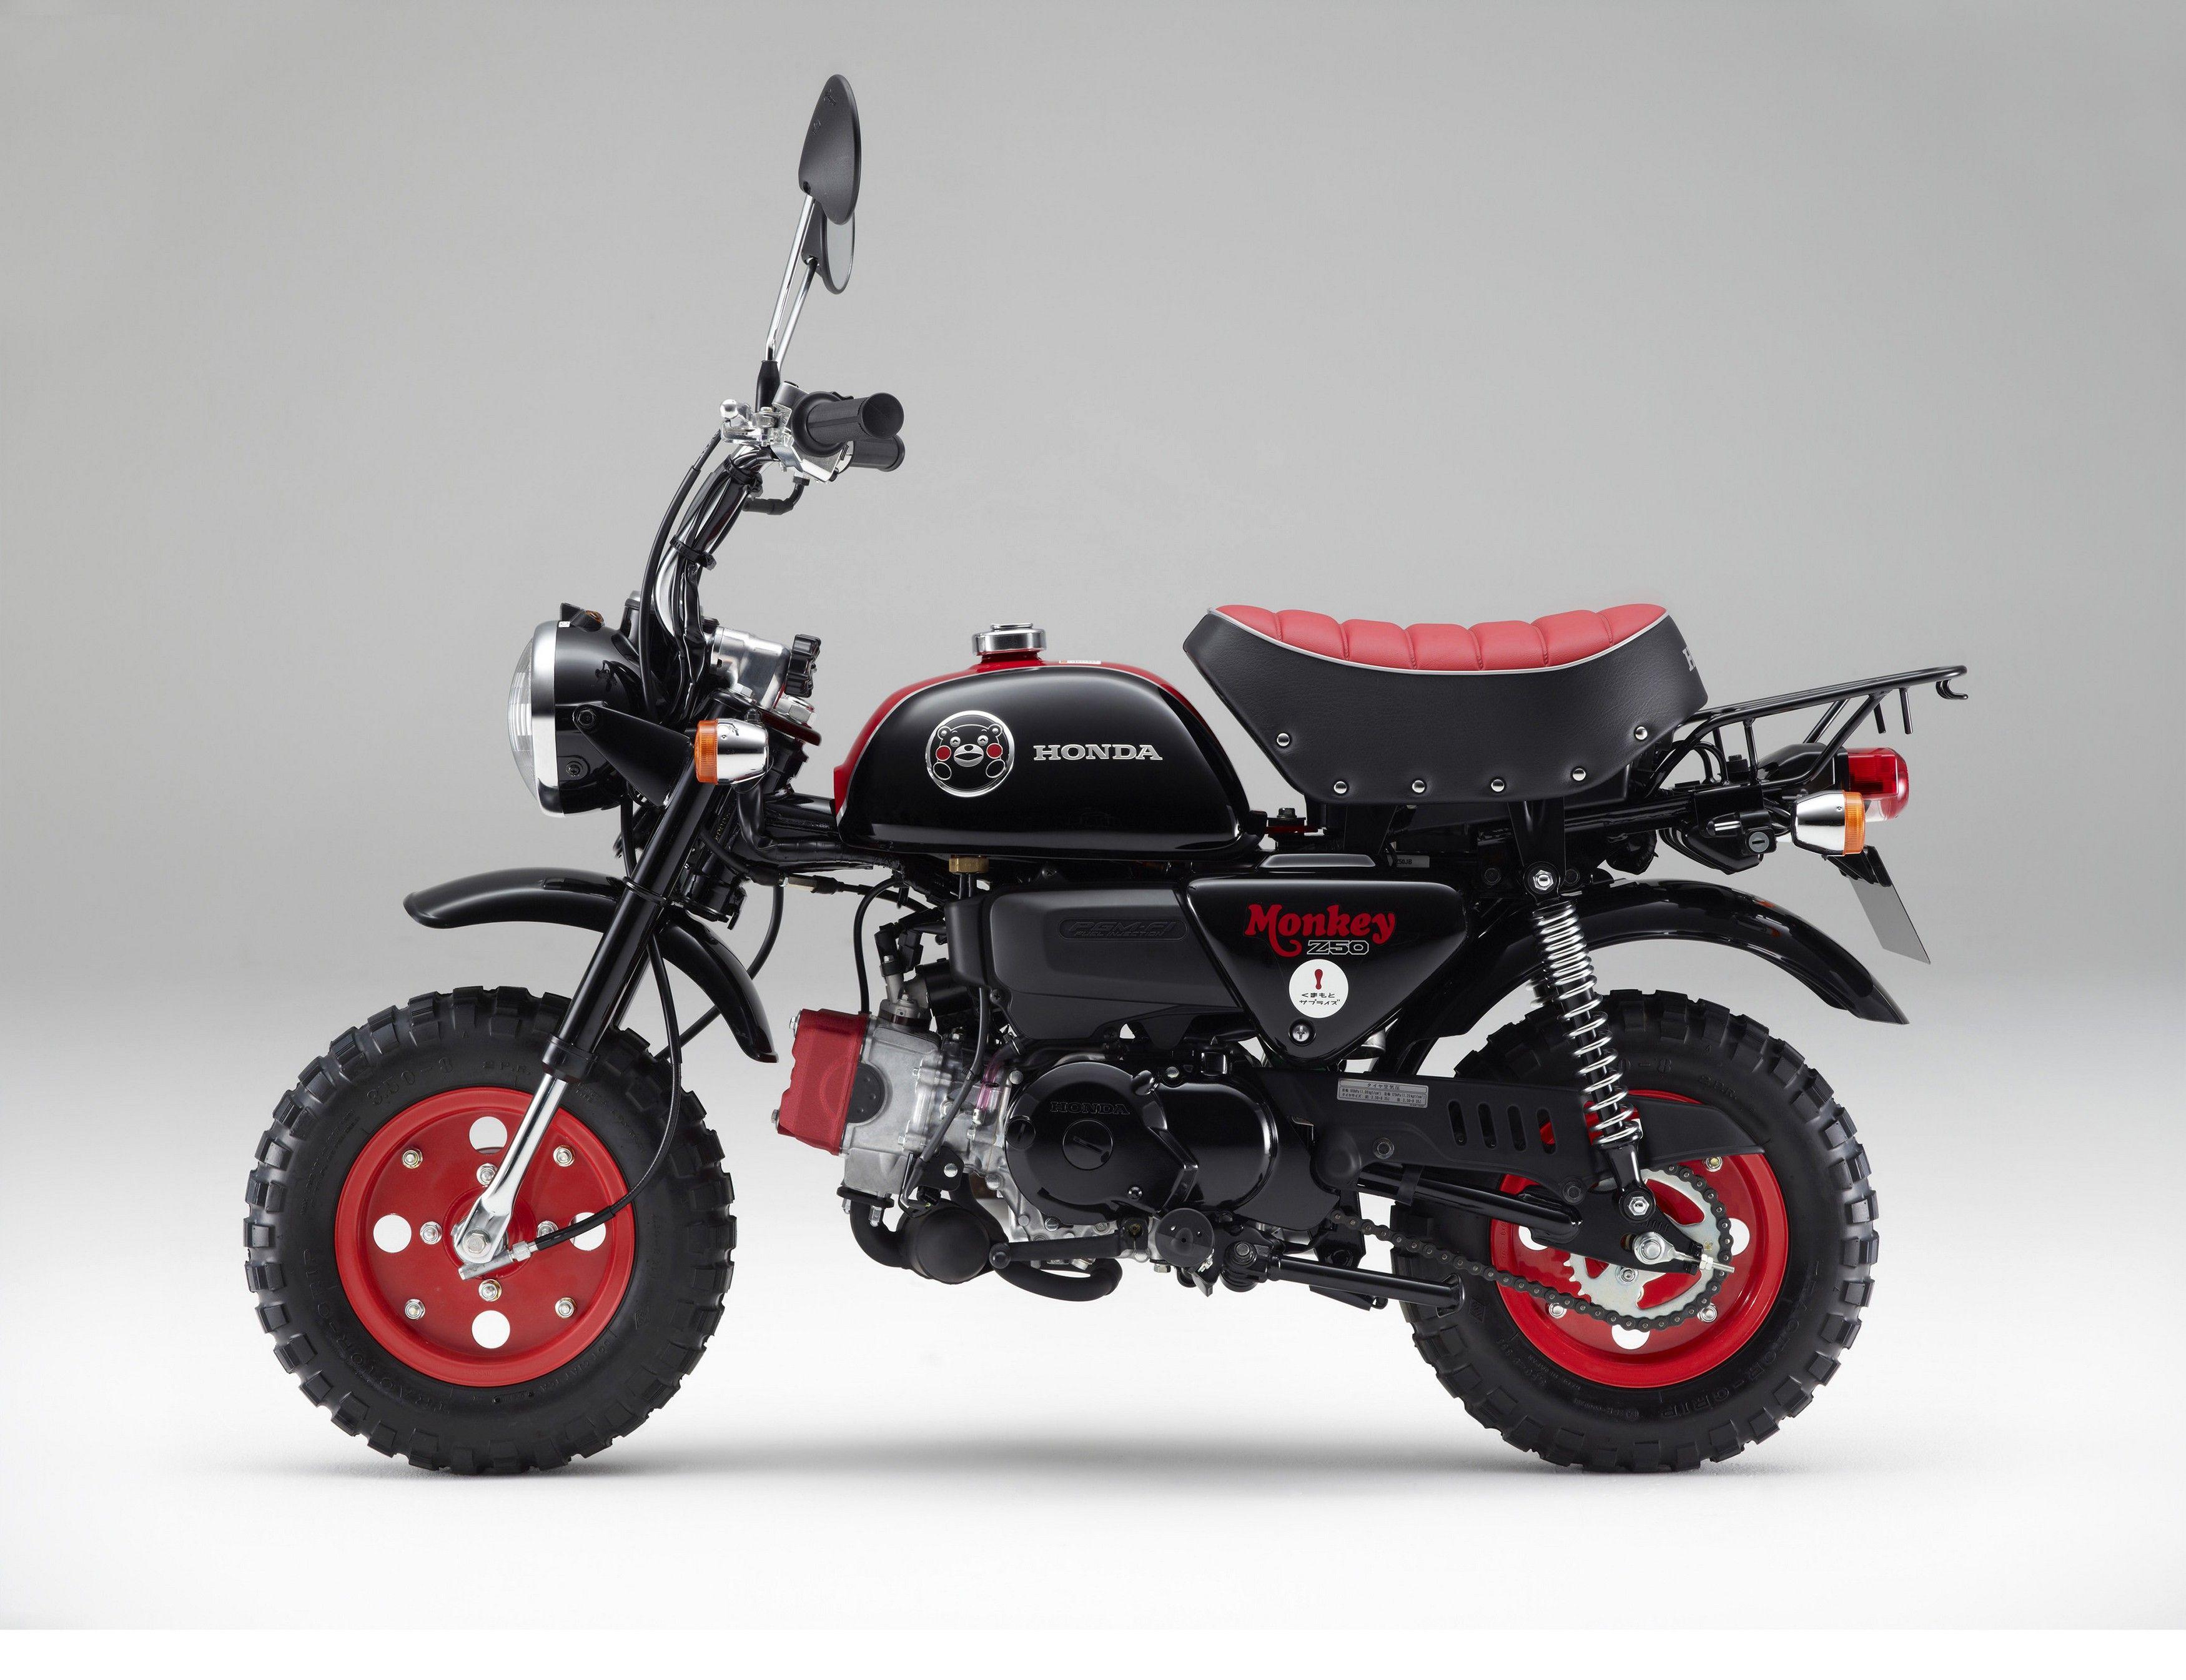 Honda Z50 Monkey Kumamon 03 2014 Pr Mini Bike Kids Bike Honda Motorcycles